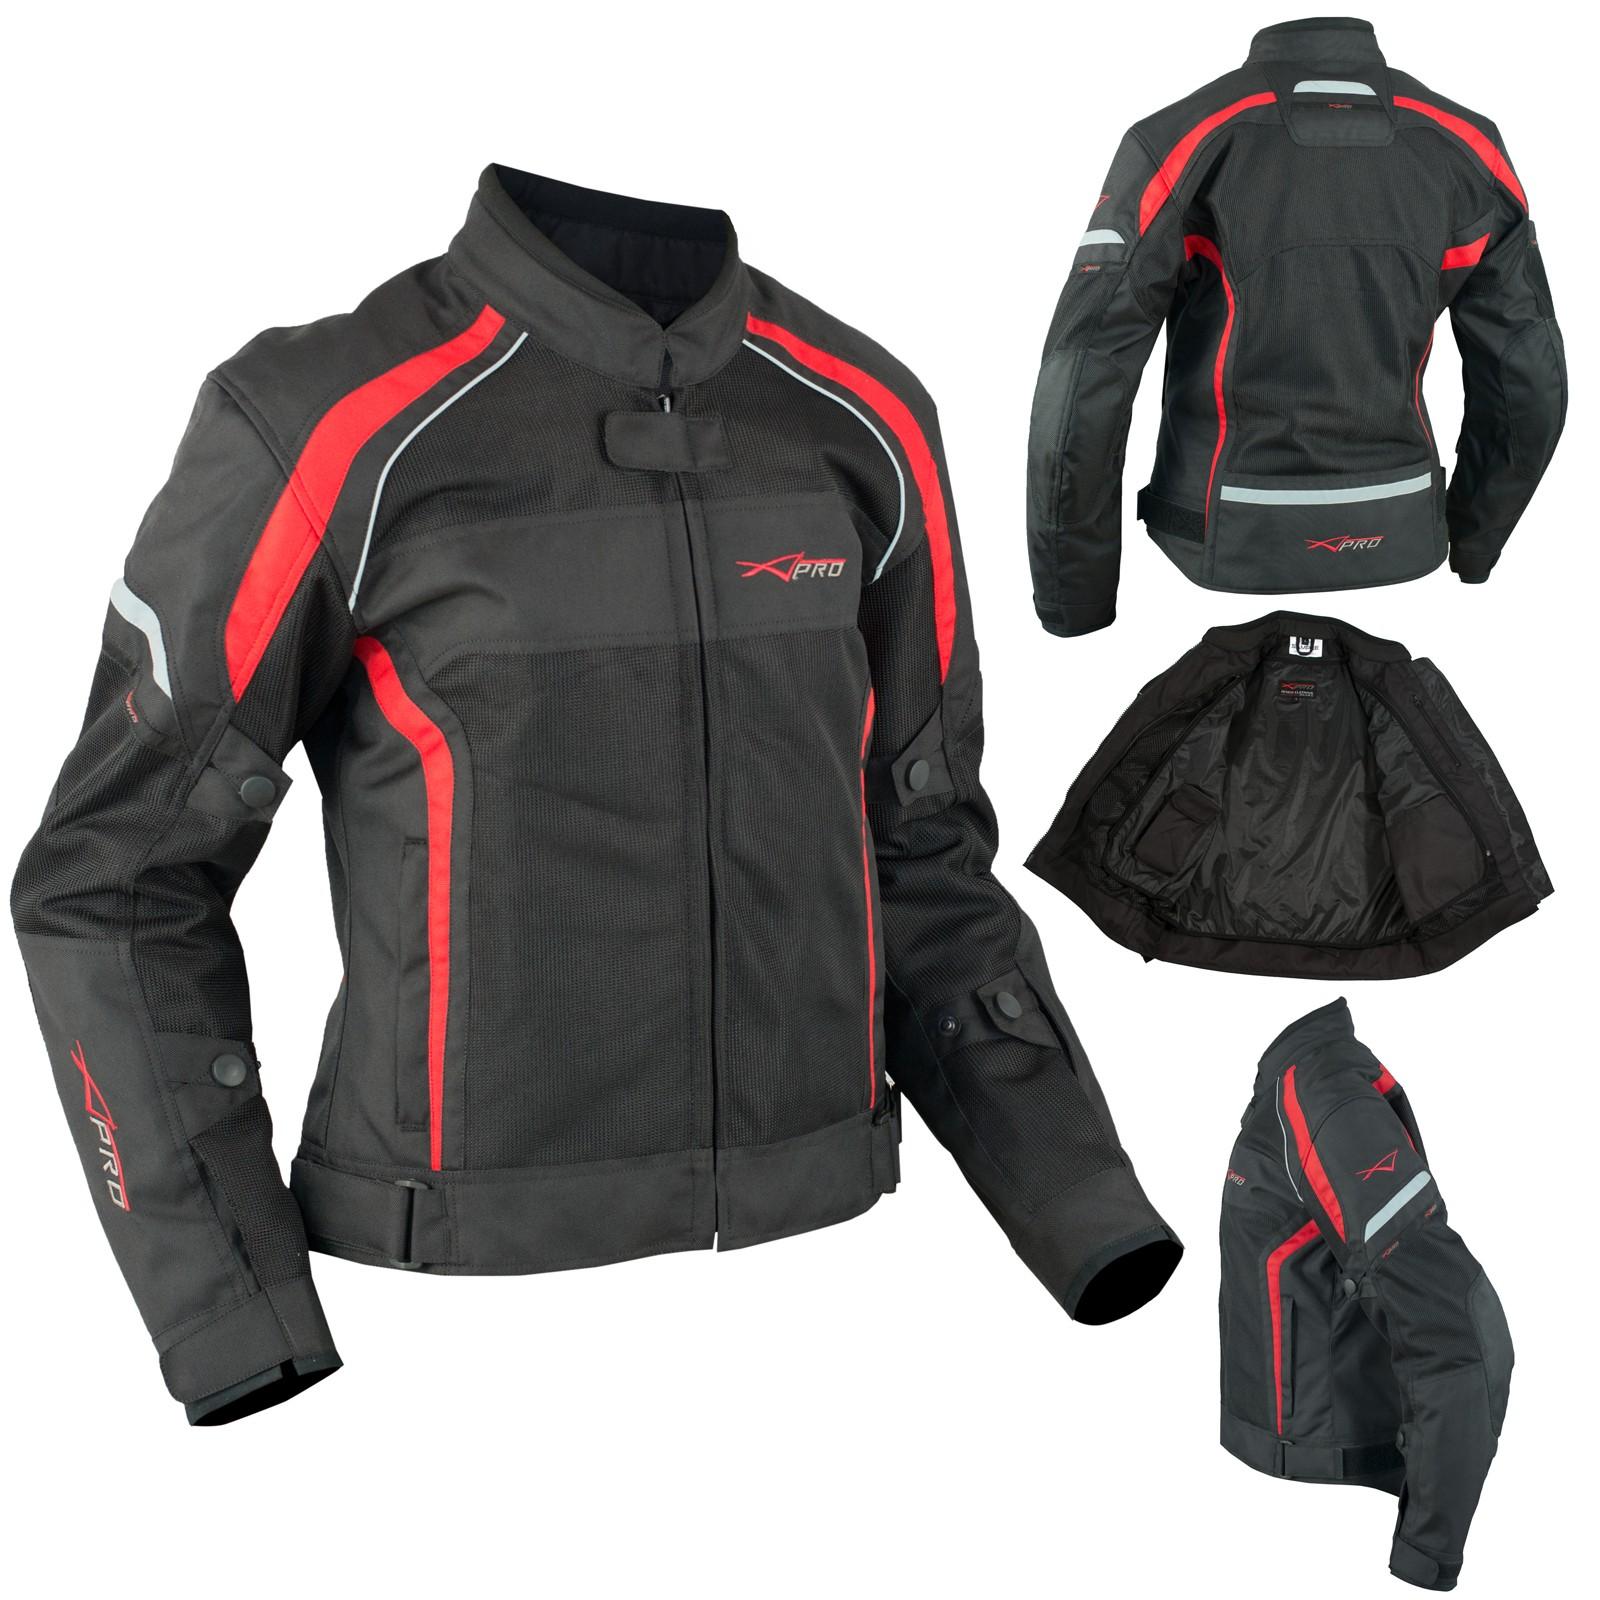 d783b14c66d Alexa Hassen Peak Luna hart Textile Tessuto Jacket Giacca A-Pro size taglia.  Mujer Transpirable Chaqueta Moto Verano Reflectantes Regulable Rojo. 45% OFF